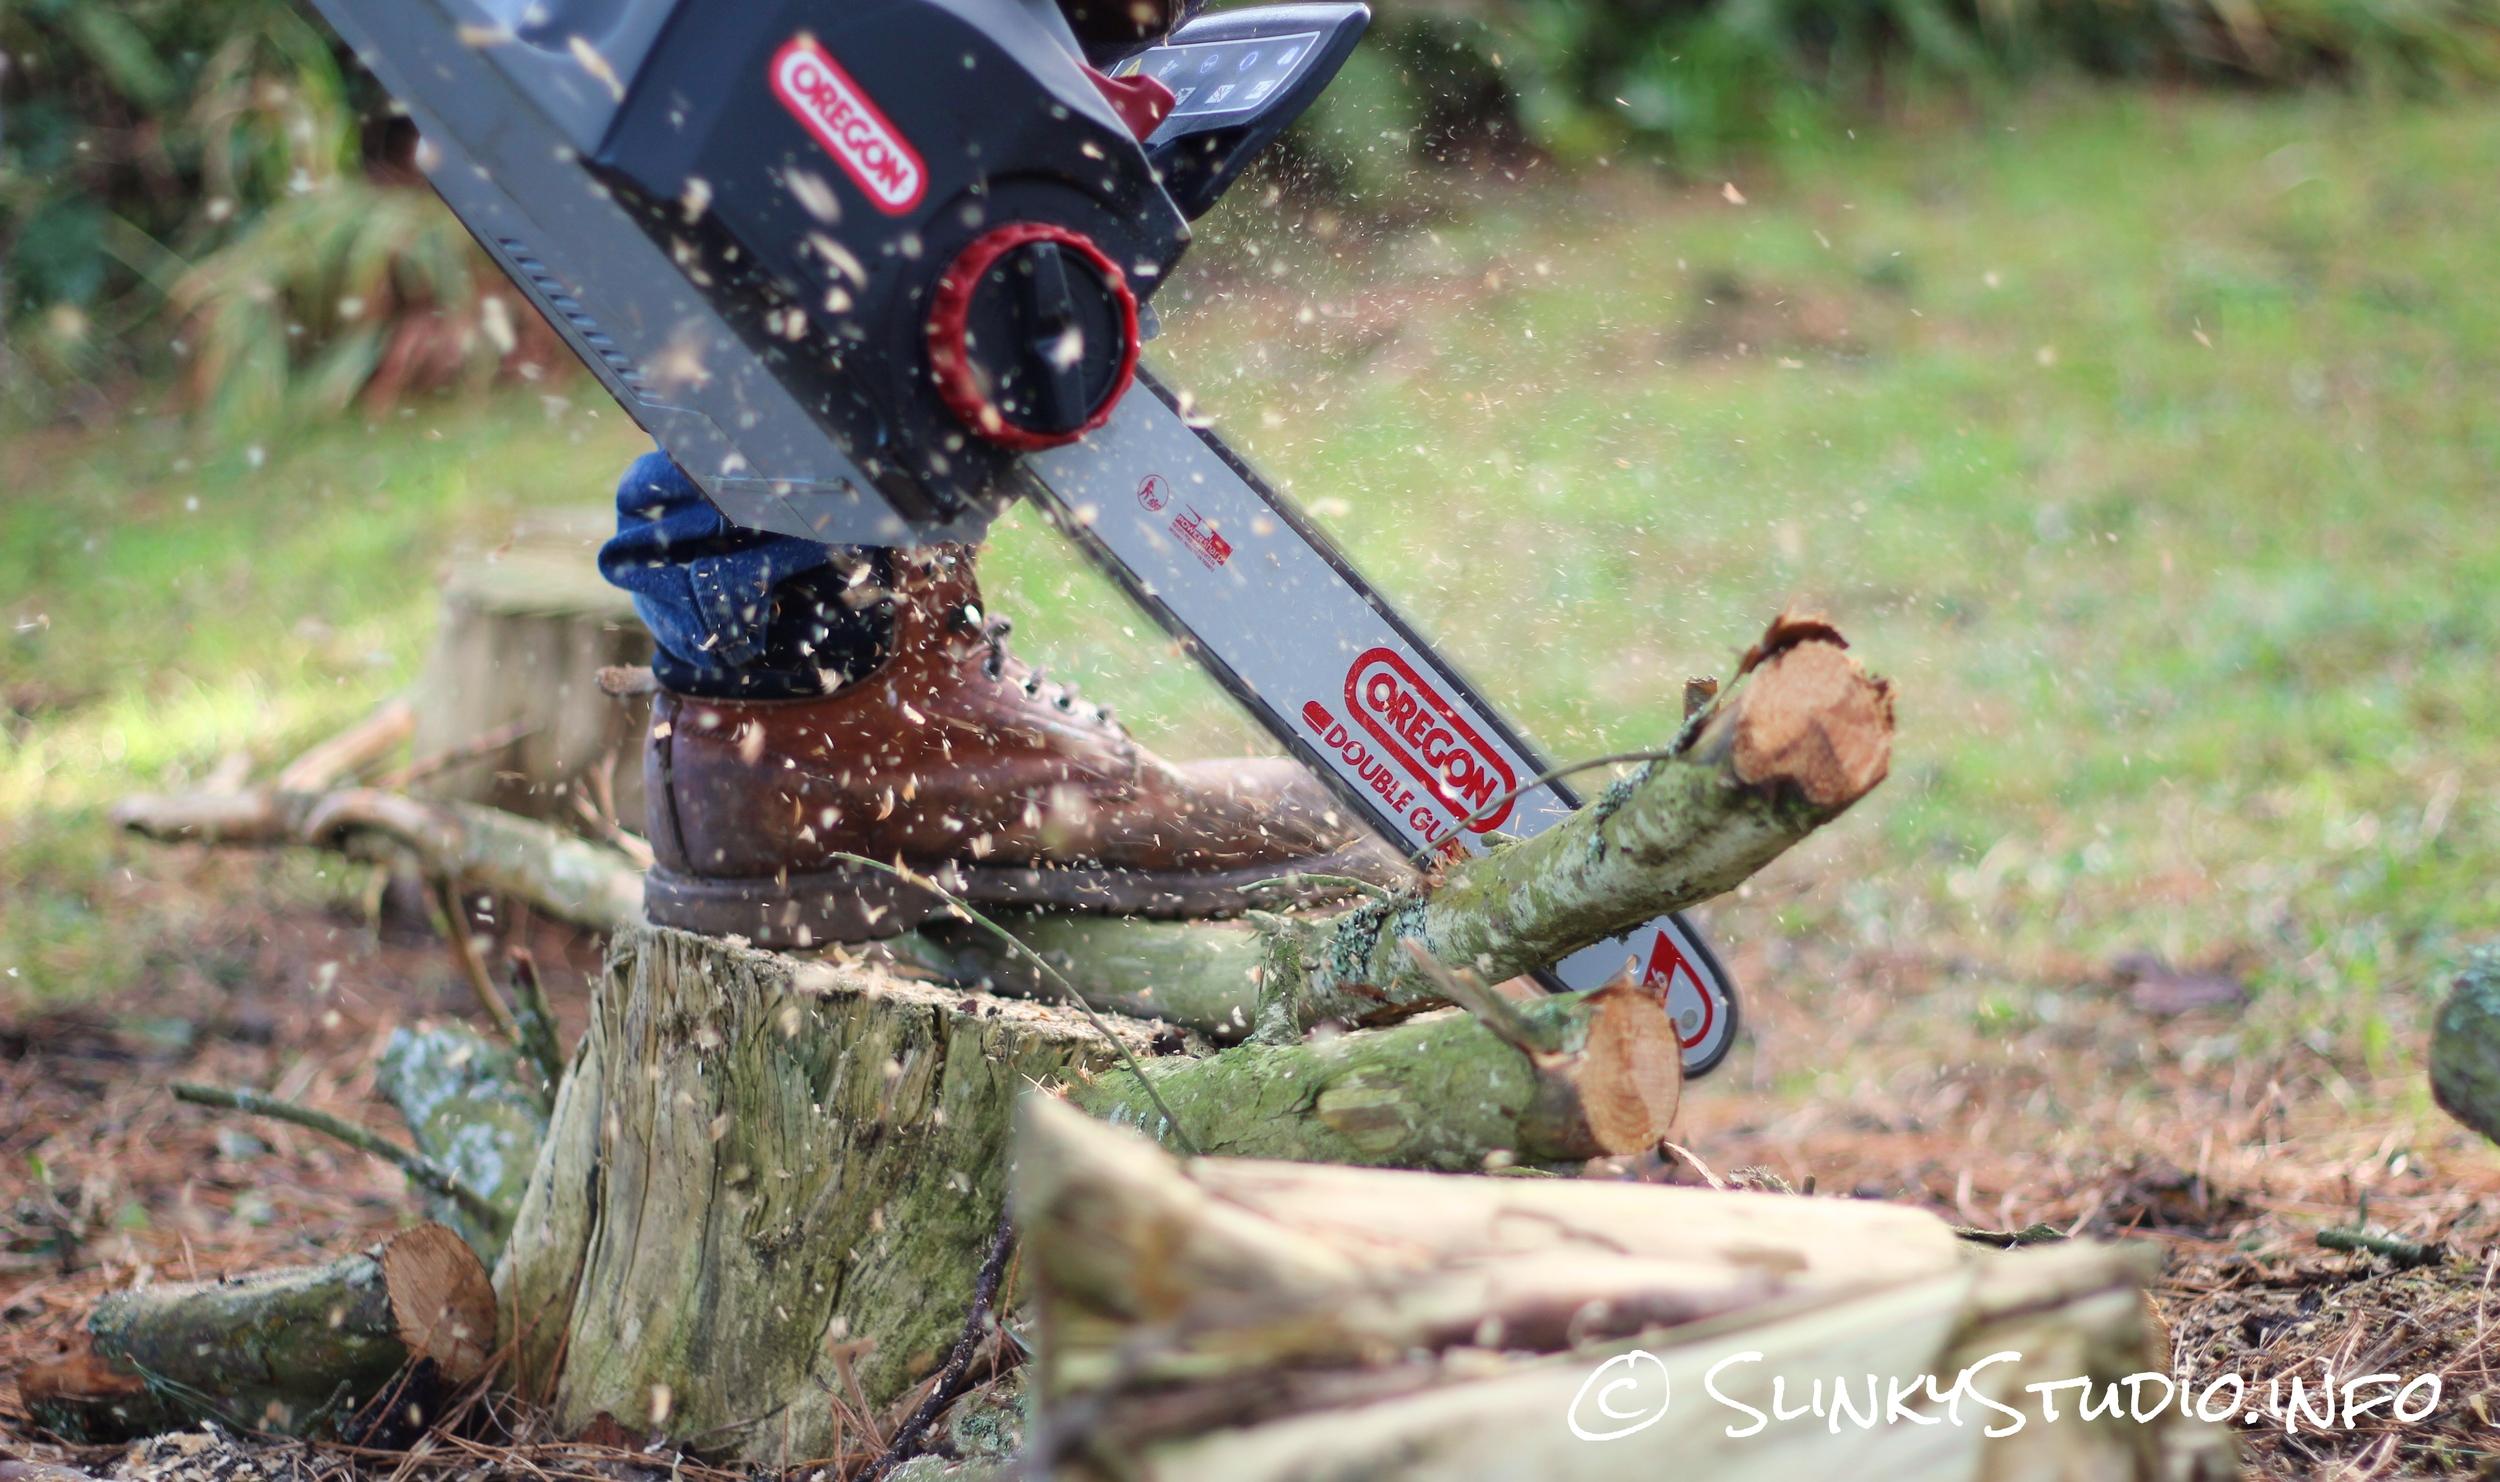 Oregon CS300 PowerNow Cordless Chainsaw Cutting Thin Branch.jpg